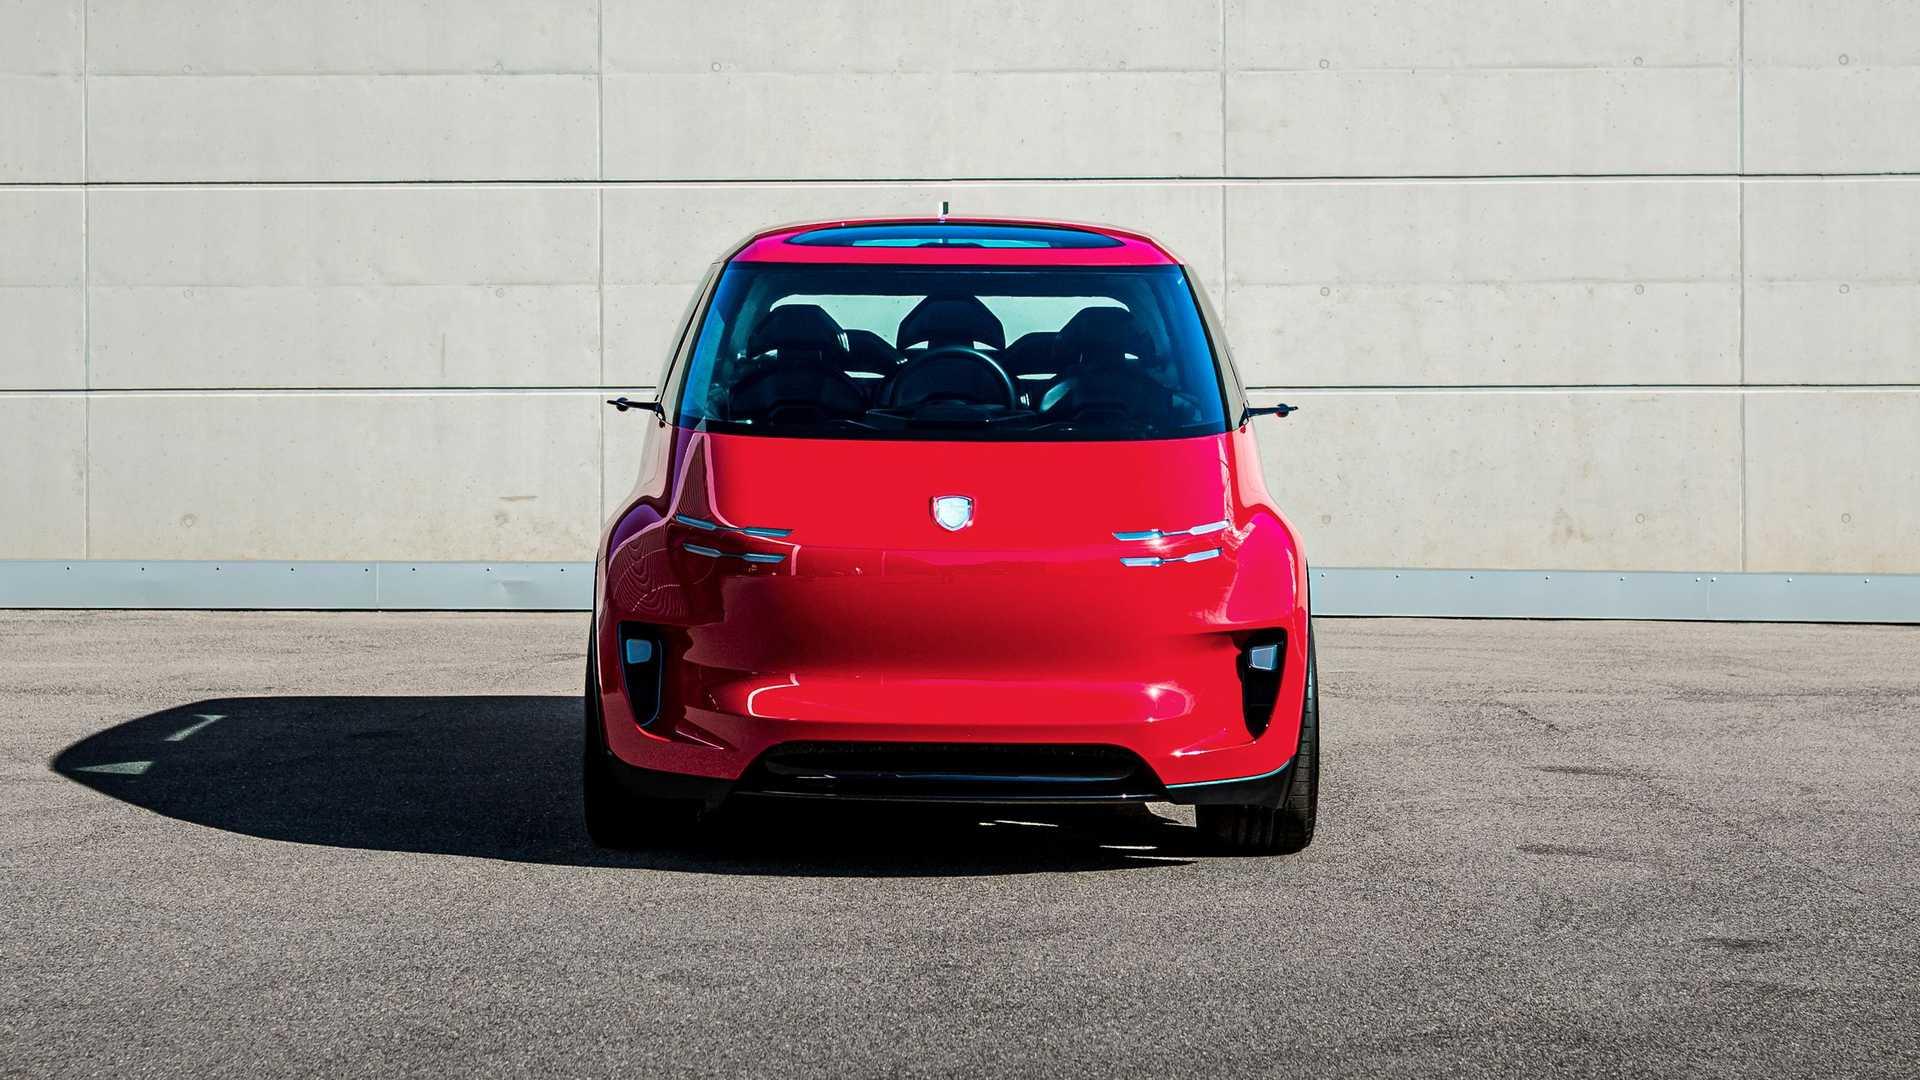 Dacă Porsche ar fi produs un monovolum, acesta ar fi fost Vision Renndienst